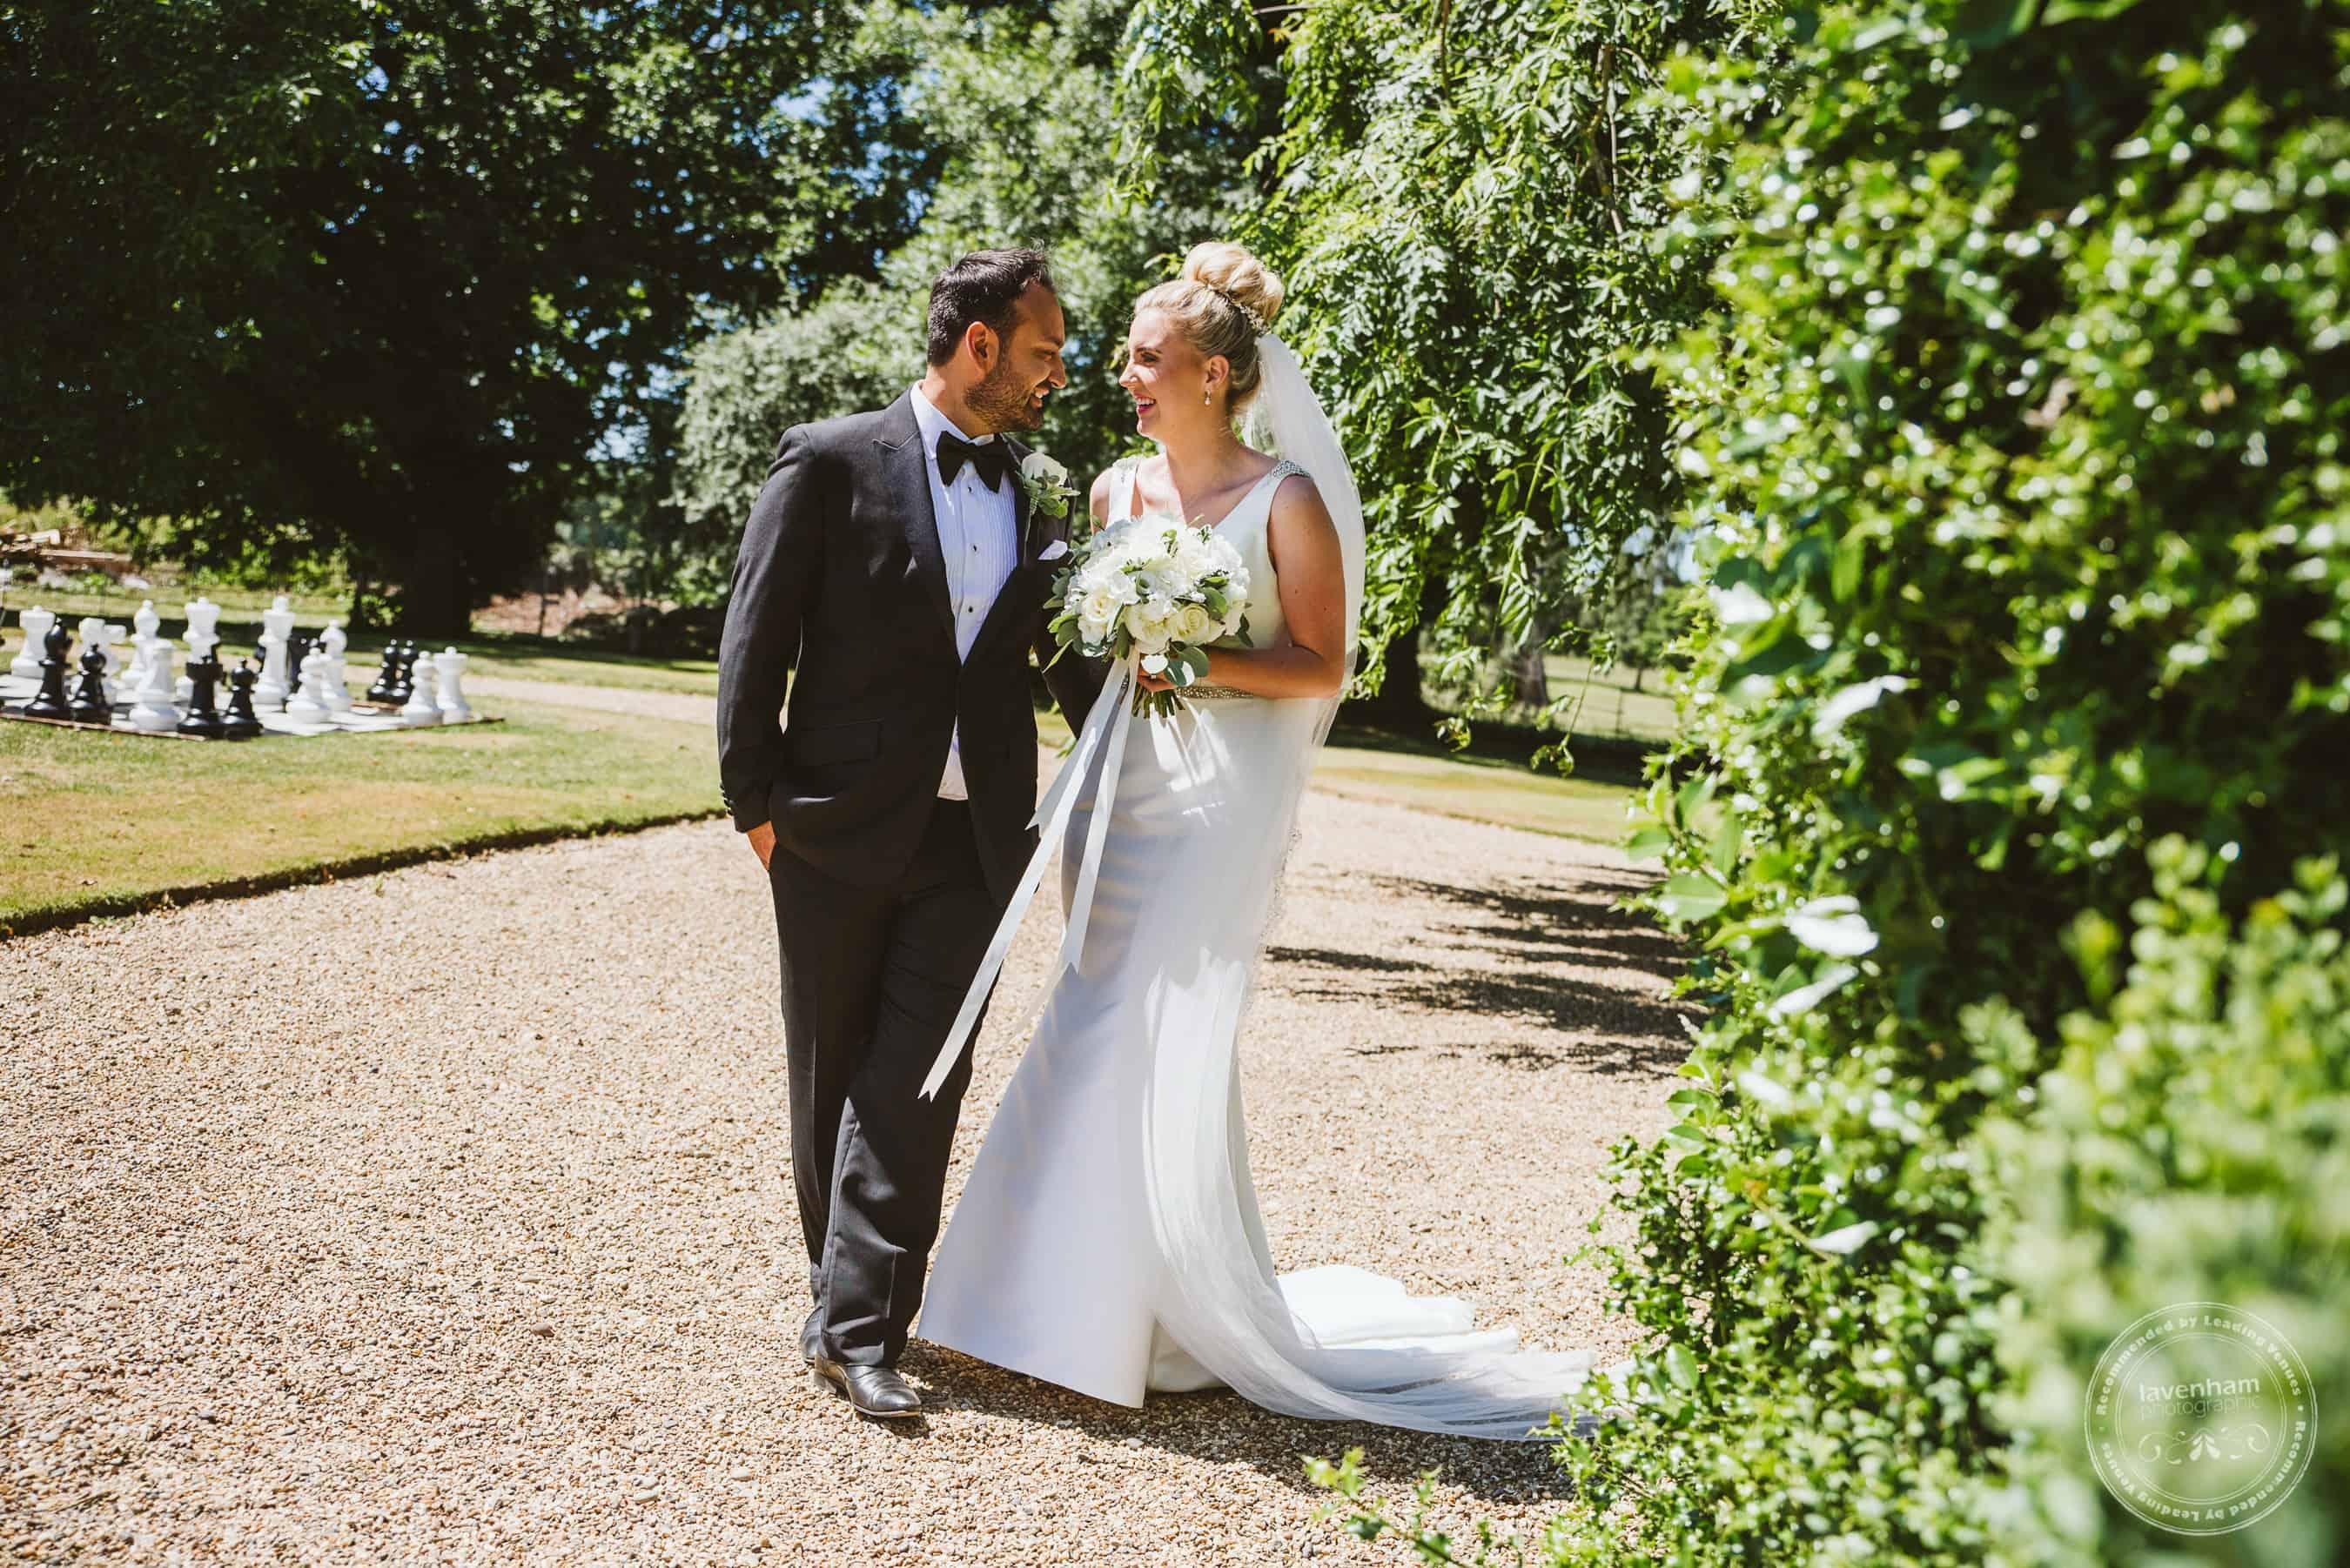 220618 Gosfield Hall Wedding Photography Lavenham Photographic 0097